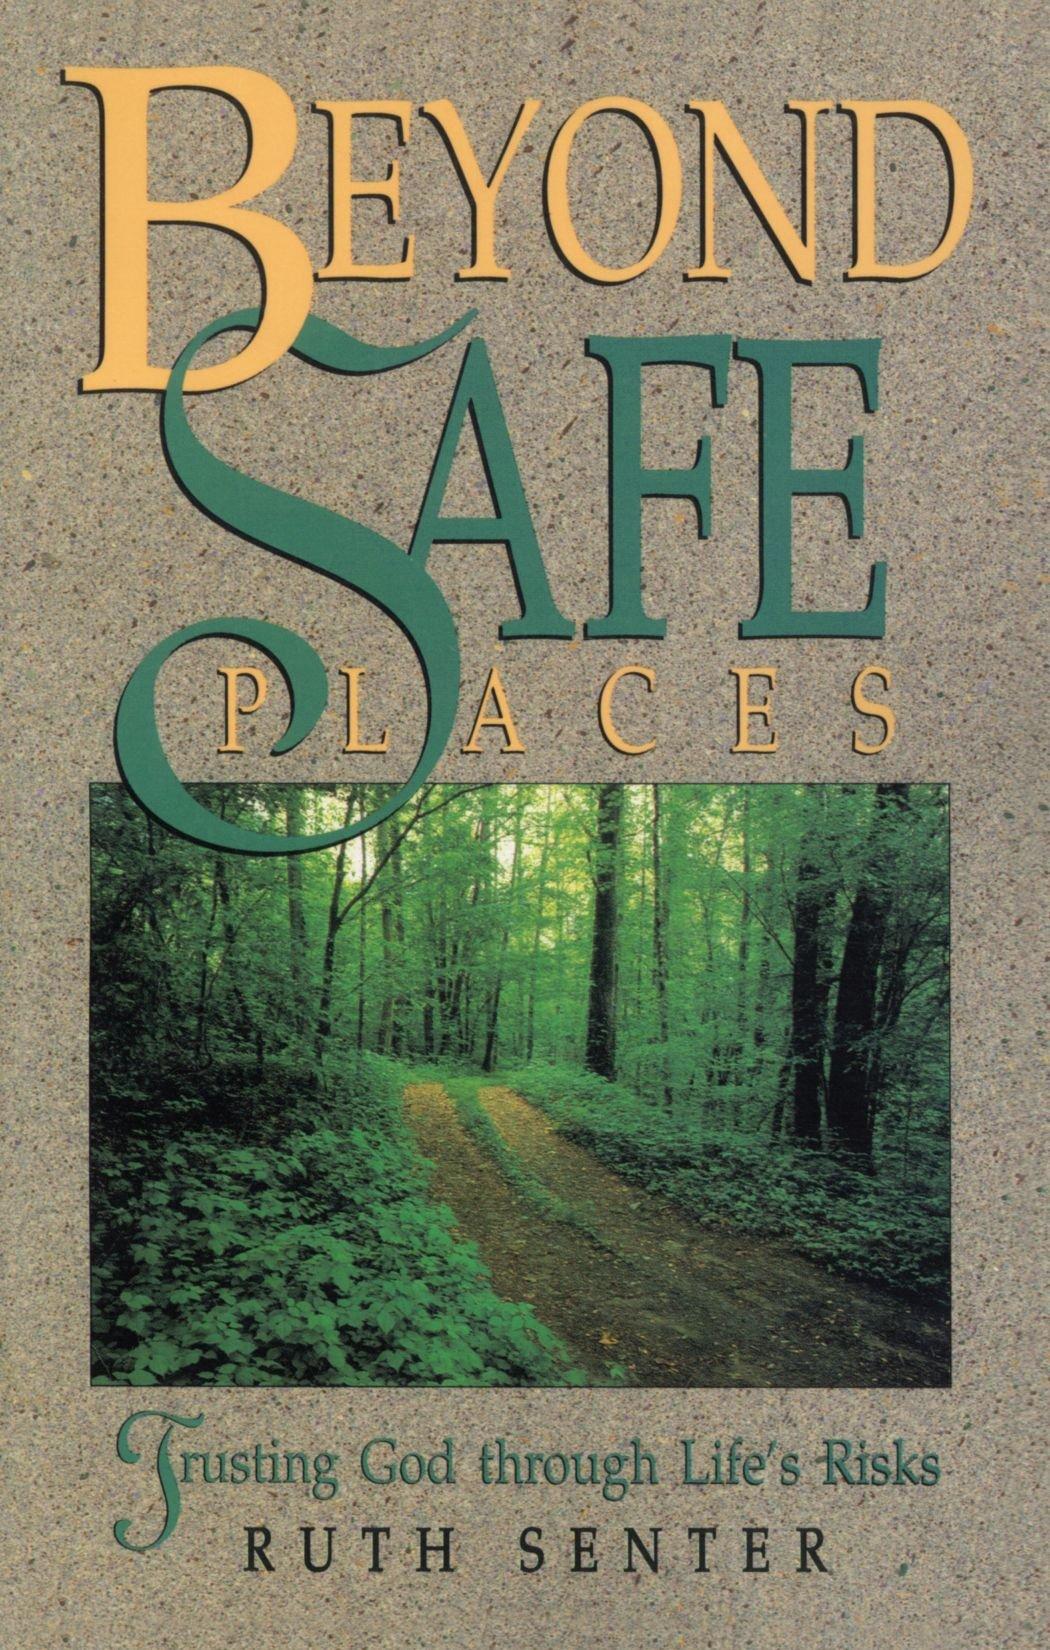 Download Beyond Safe Places: Trusting God through Life's Risks pdf